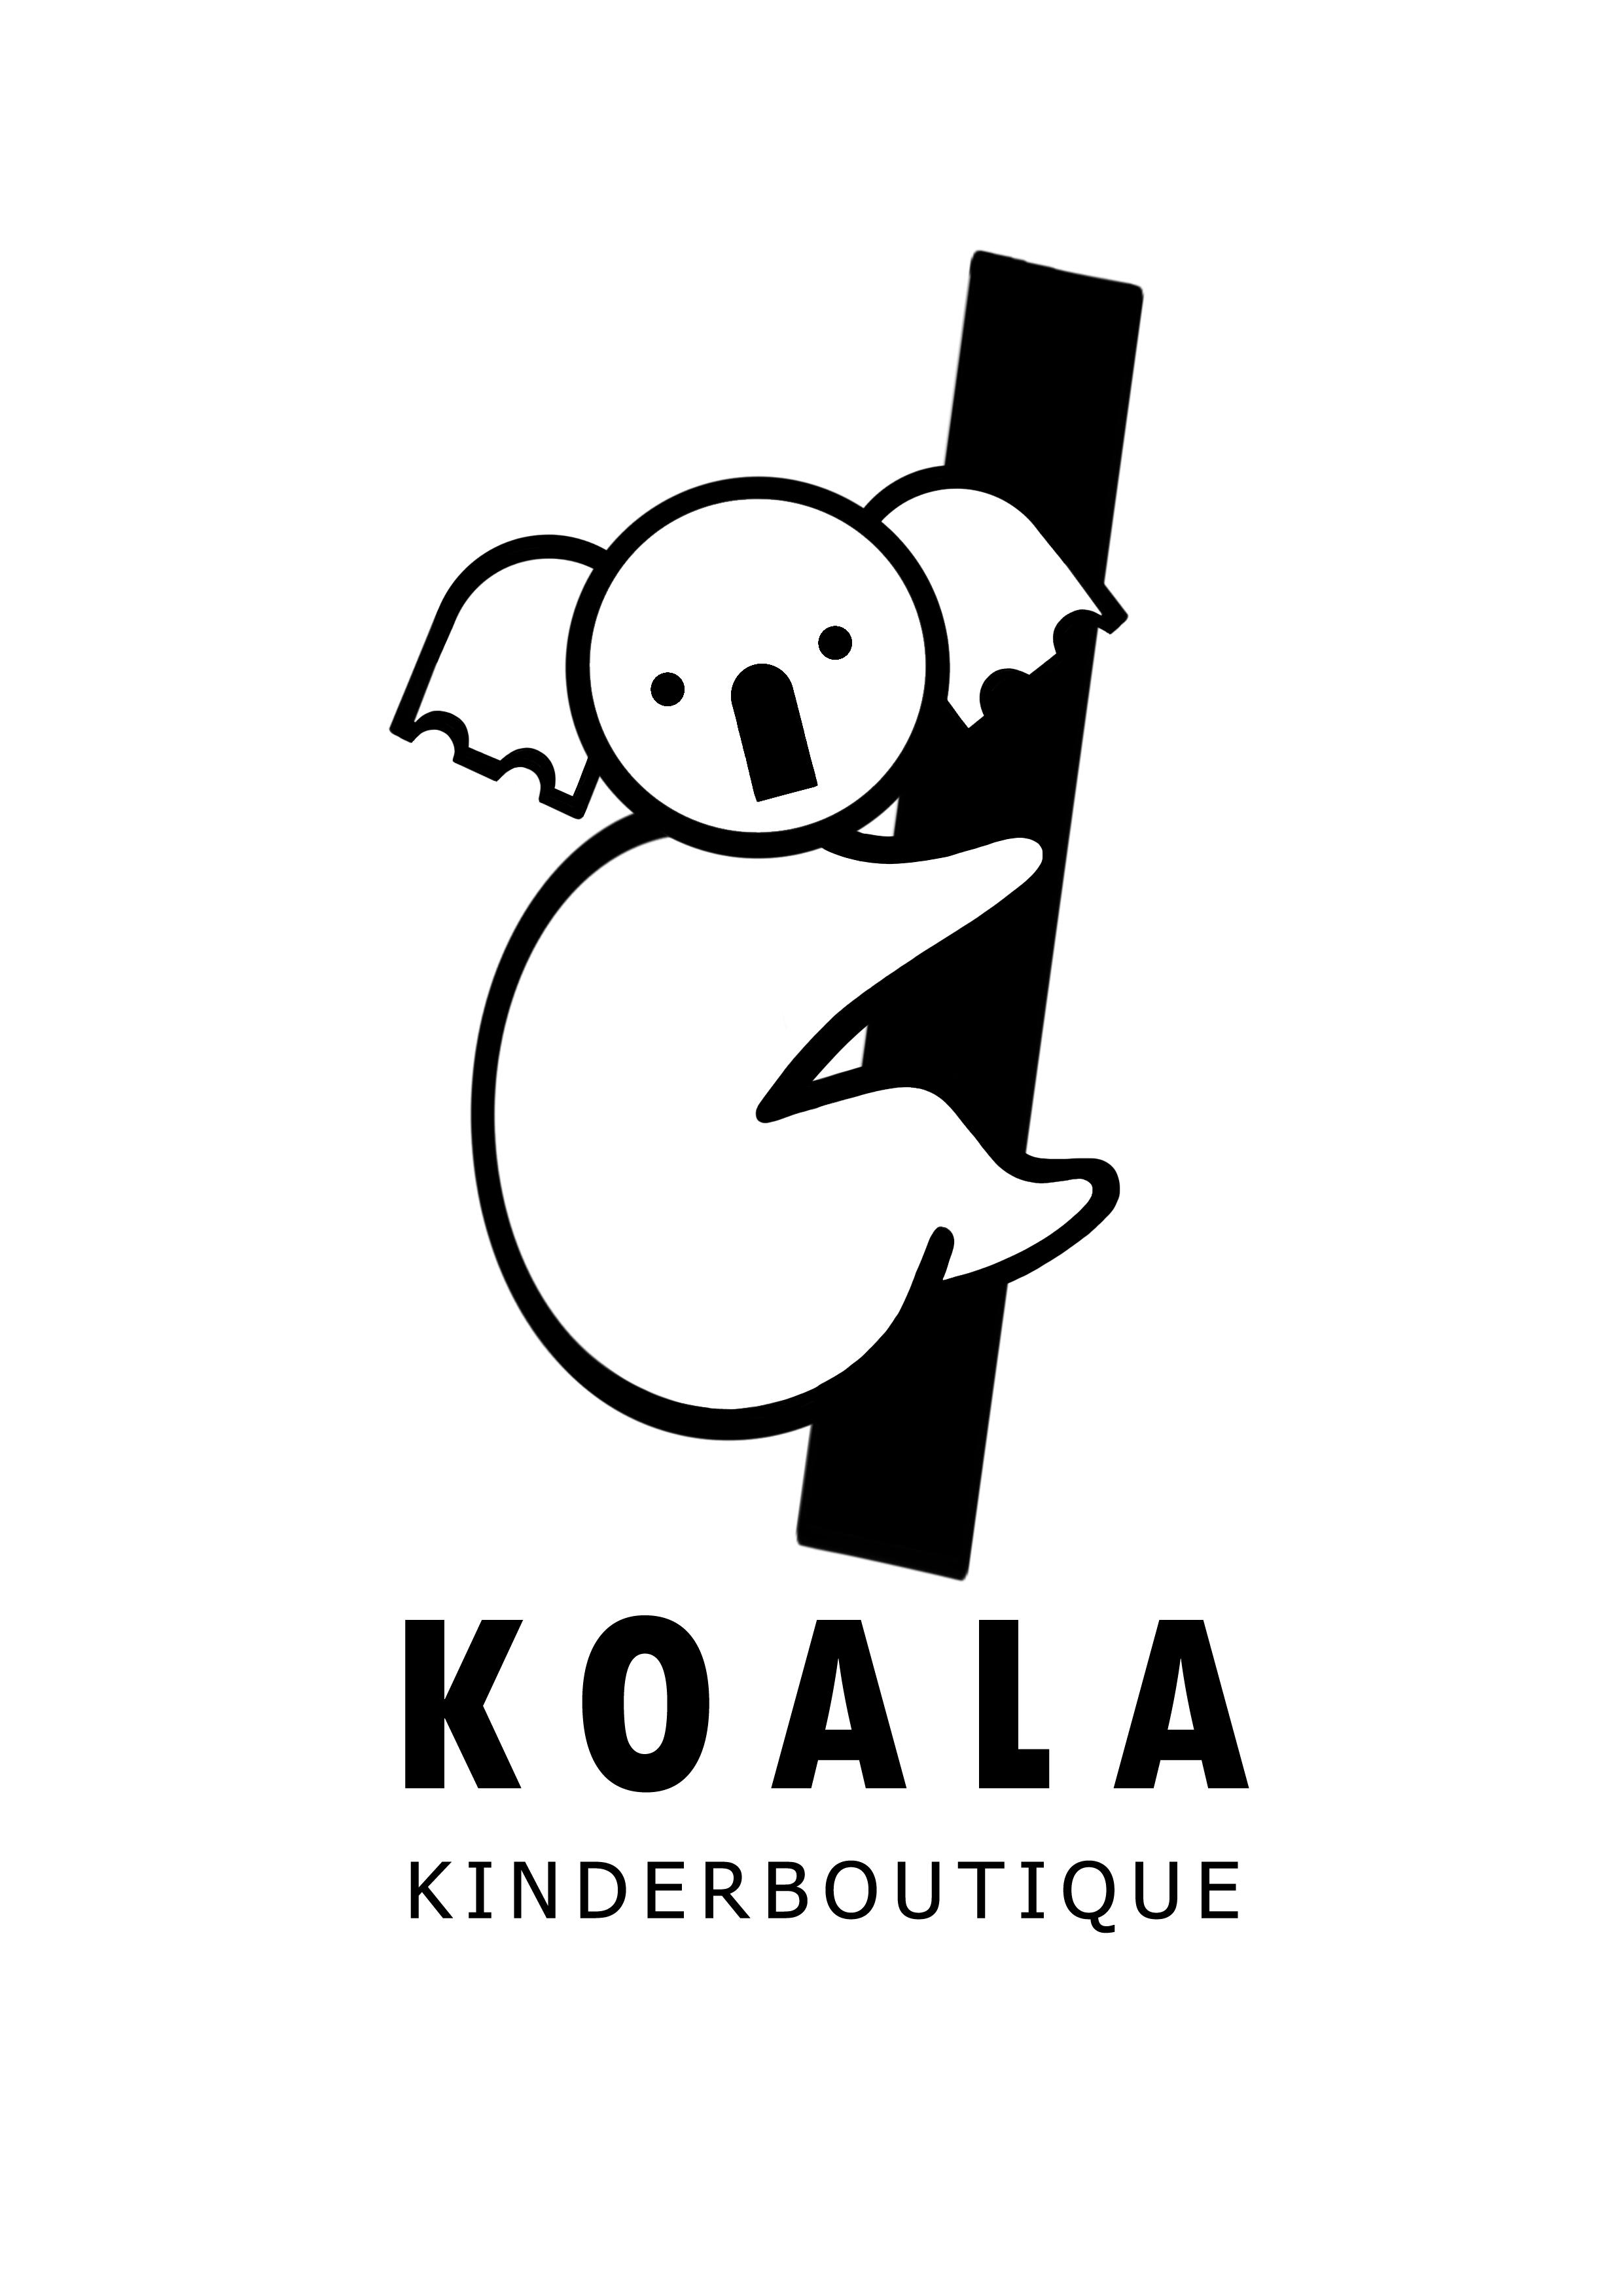 koala logo design